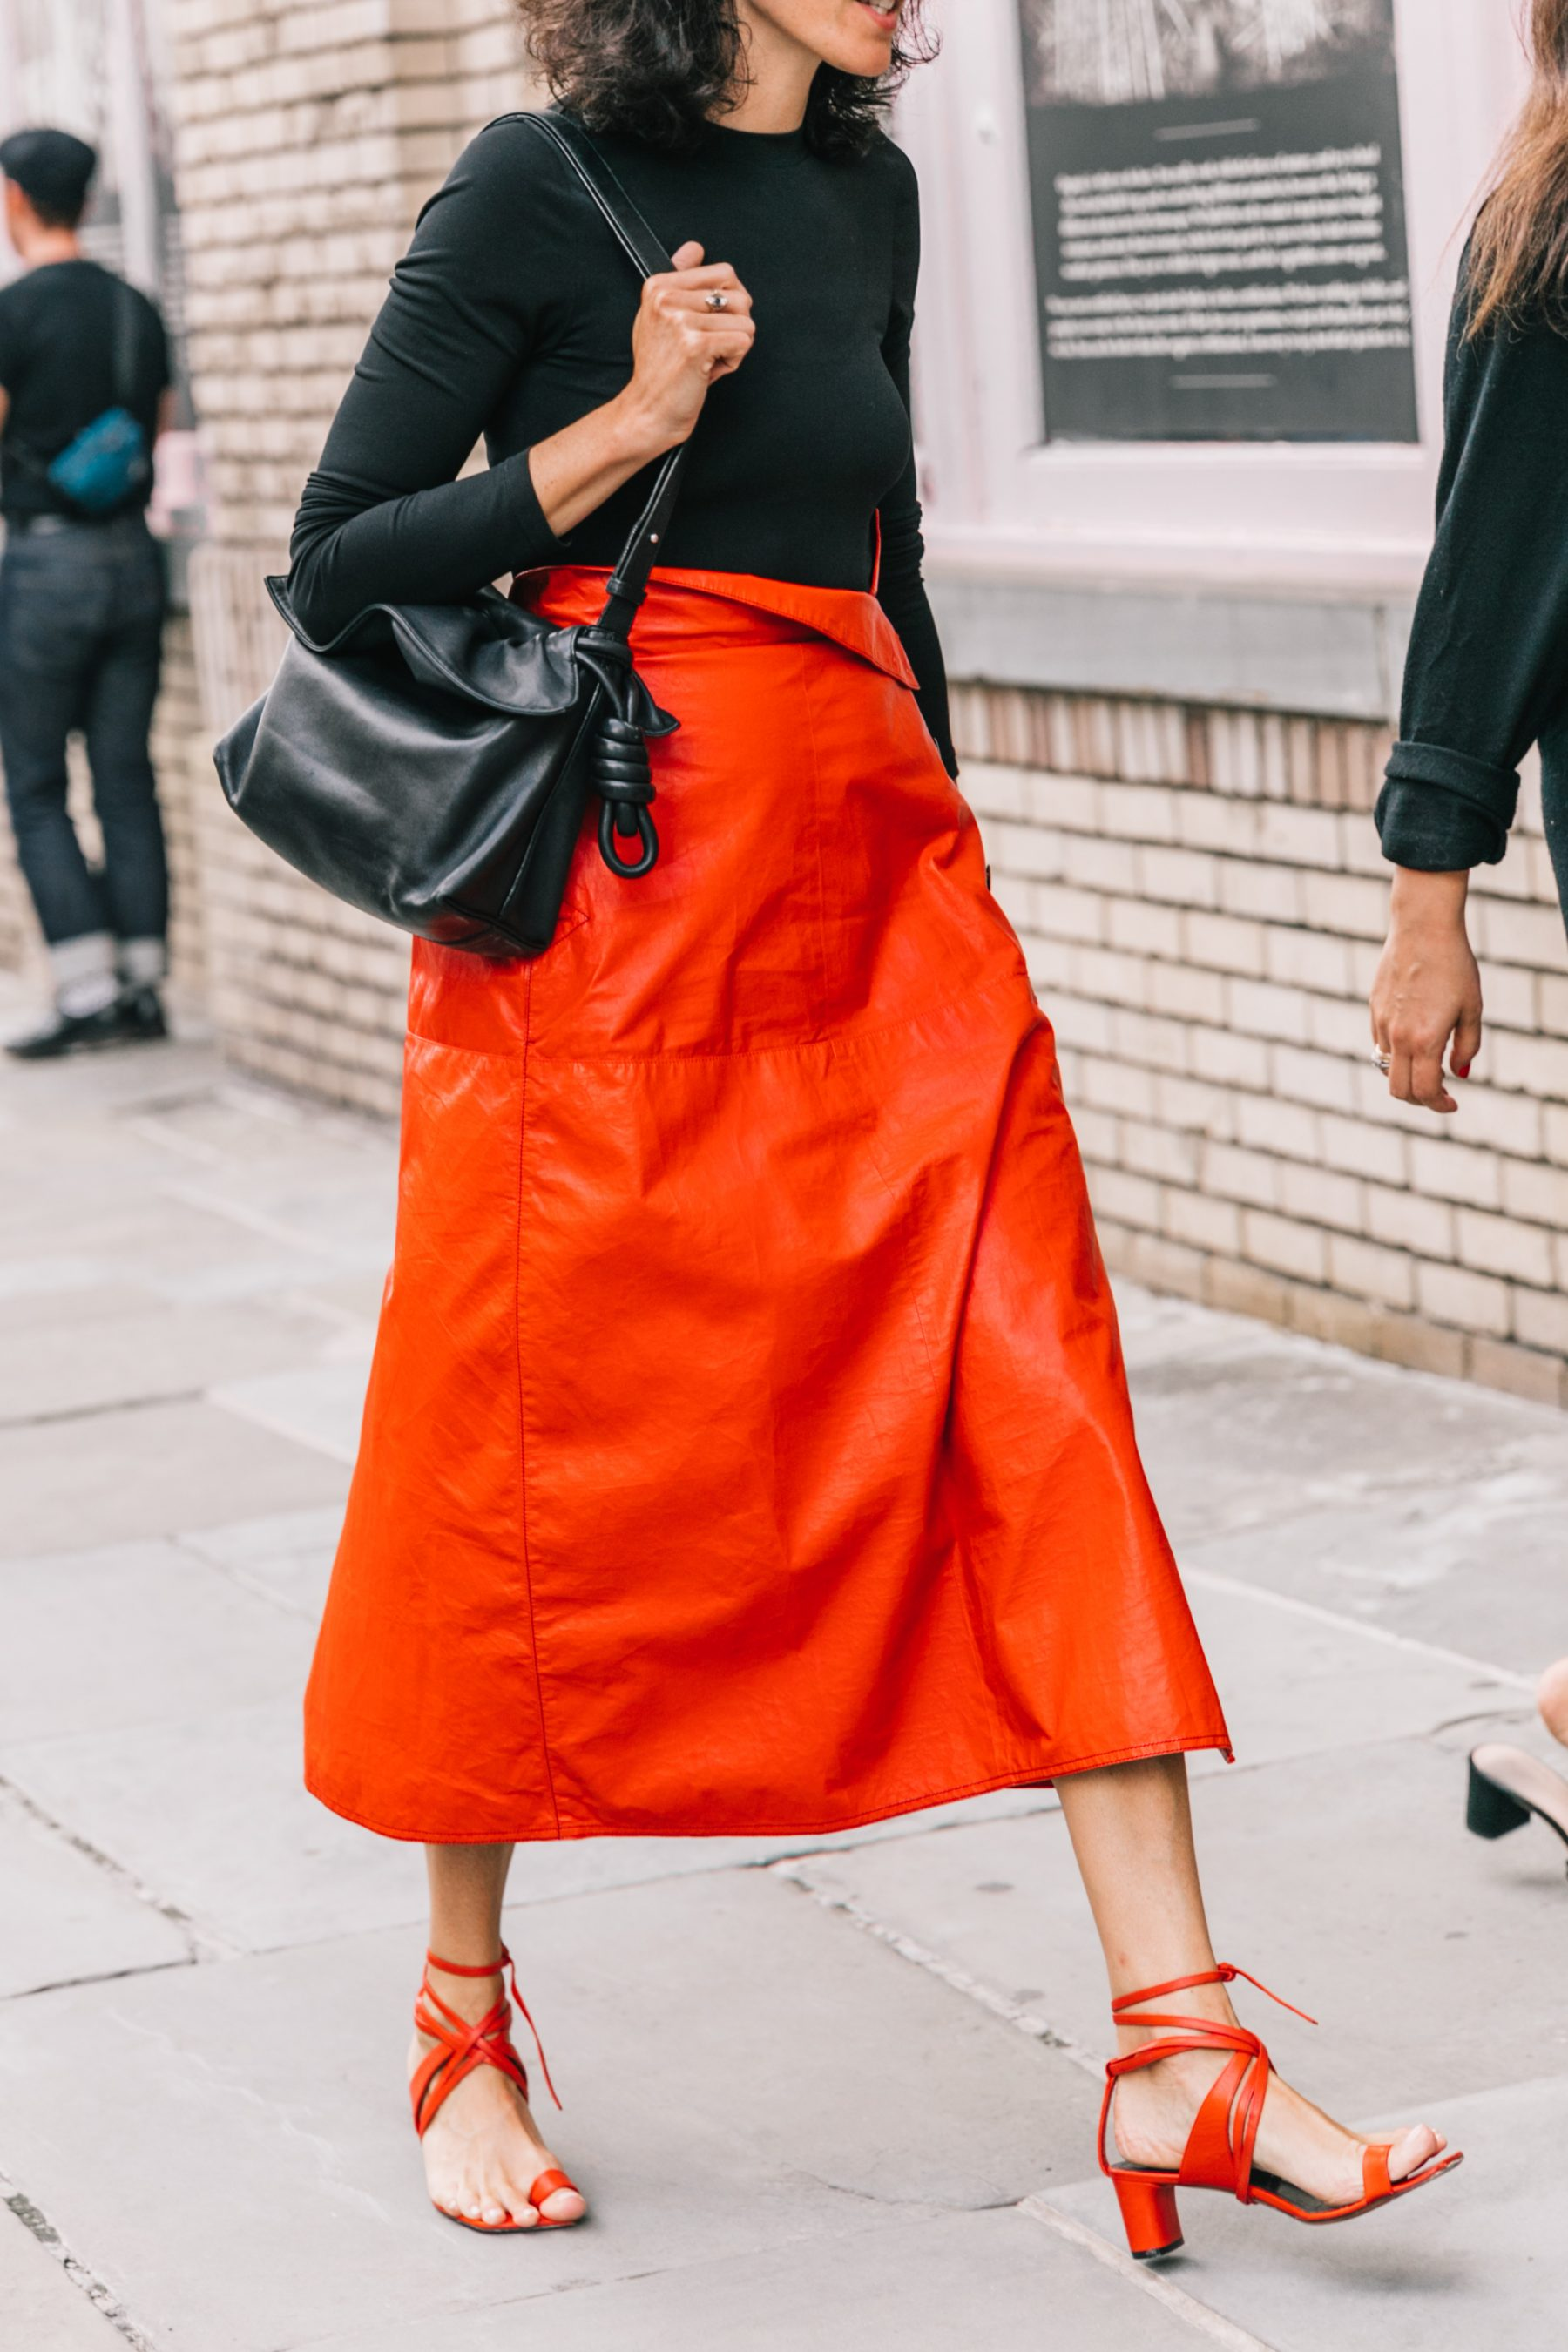 NYFW-SS18-New_York_Fashion_Week-Street_Style-Vogue-Collage_Vintage-143-1800x2700